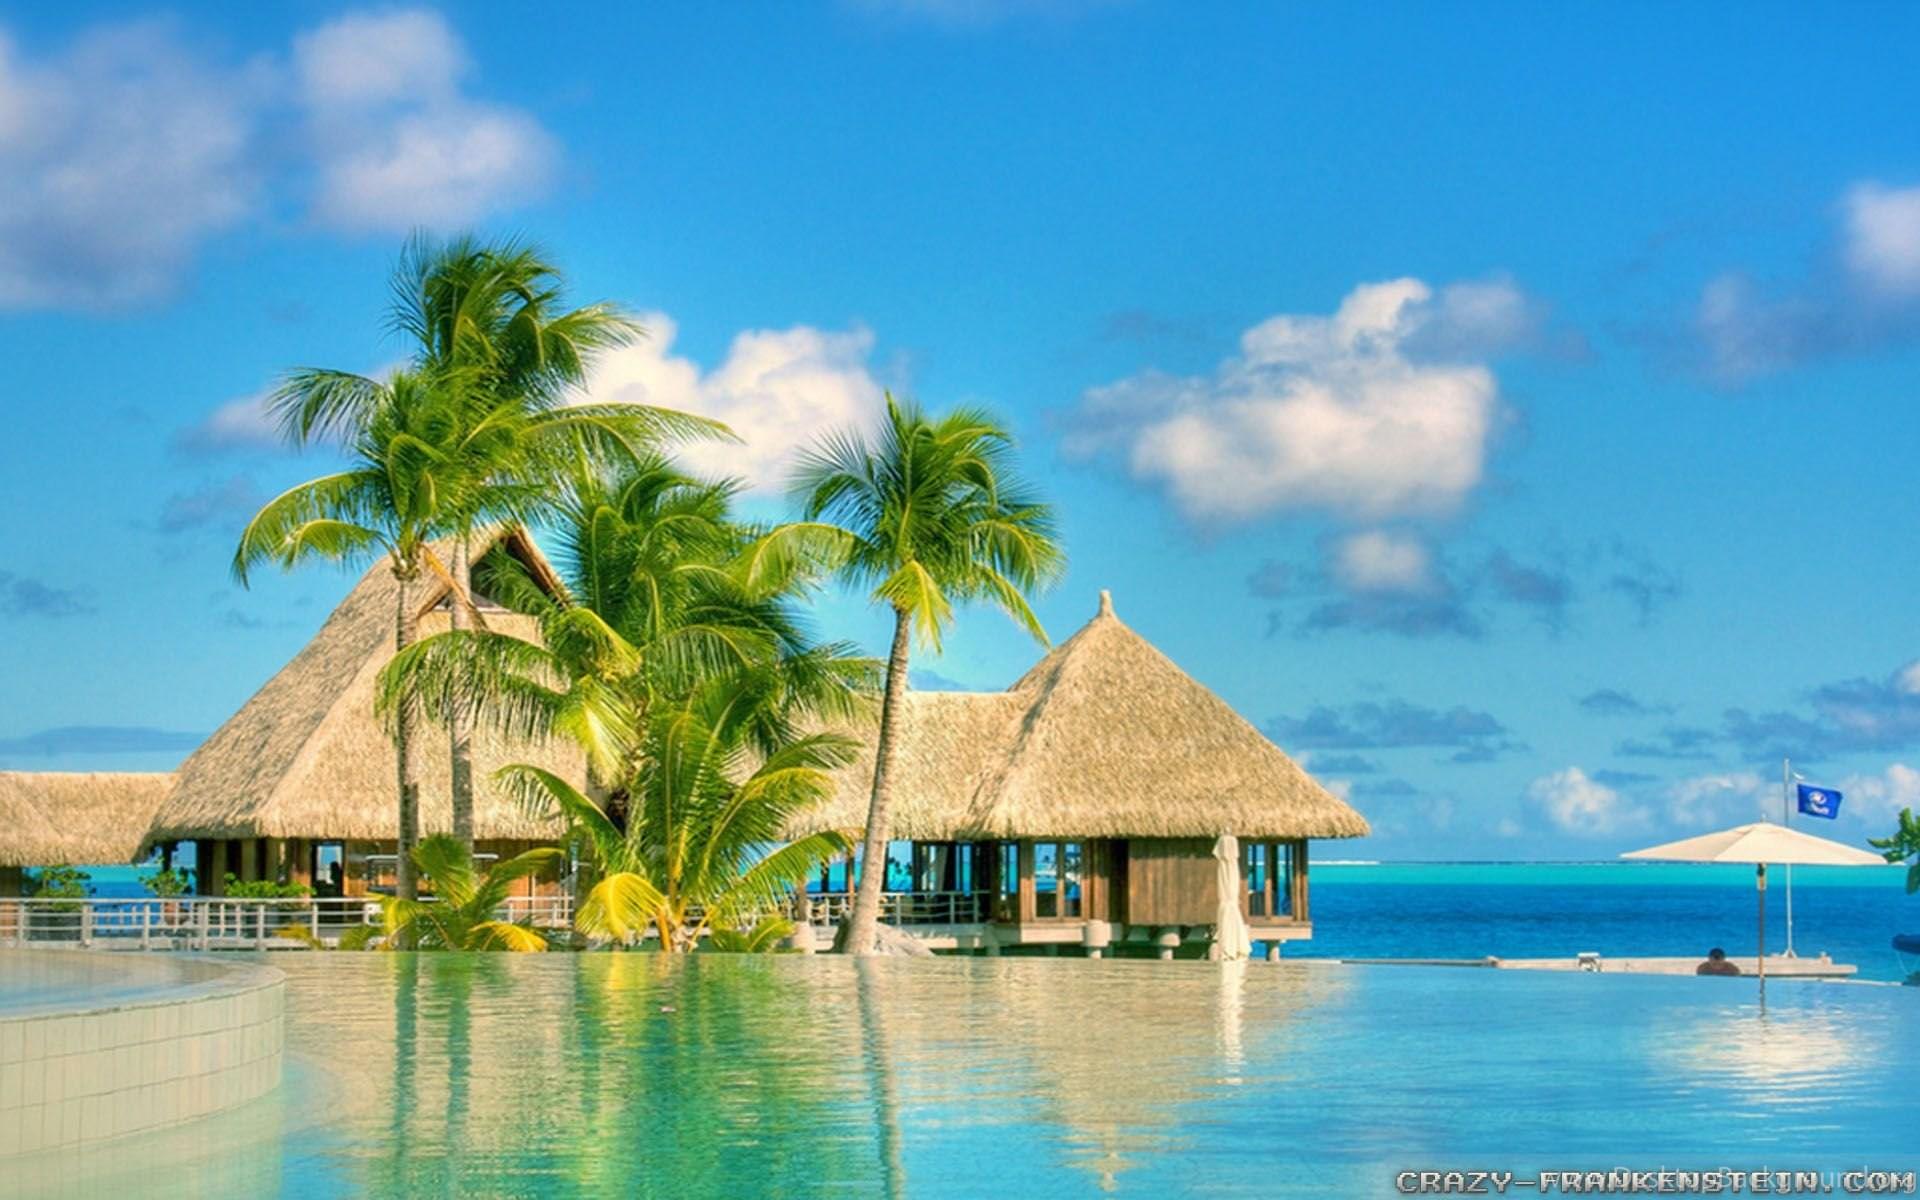 Travel Wallpapers Hd 1366x768: Beautiful Summer Screensavers Wallpapers Desktop Background